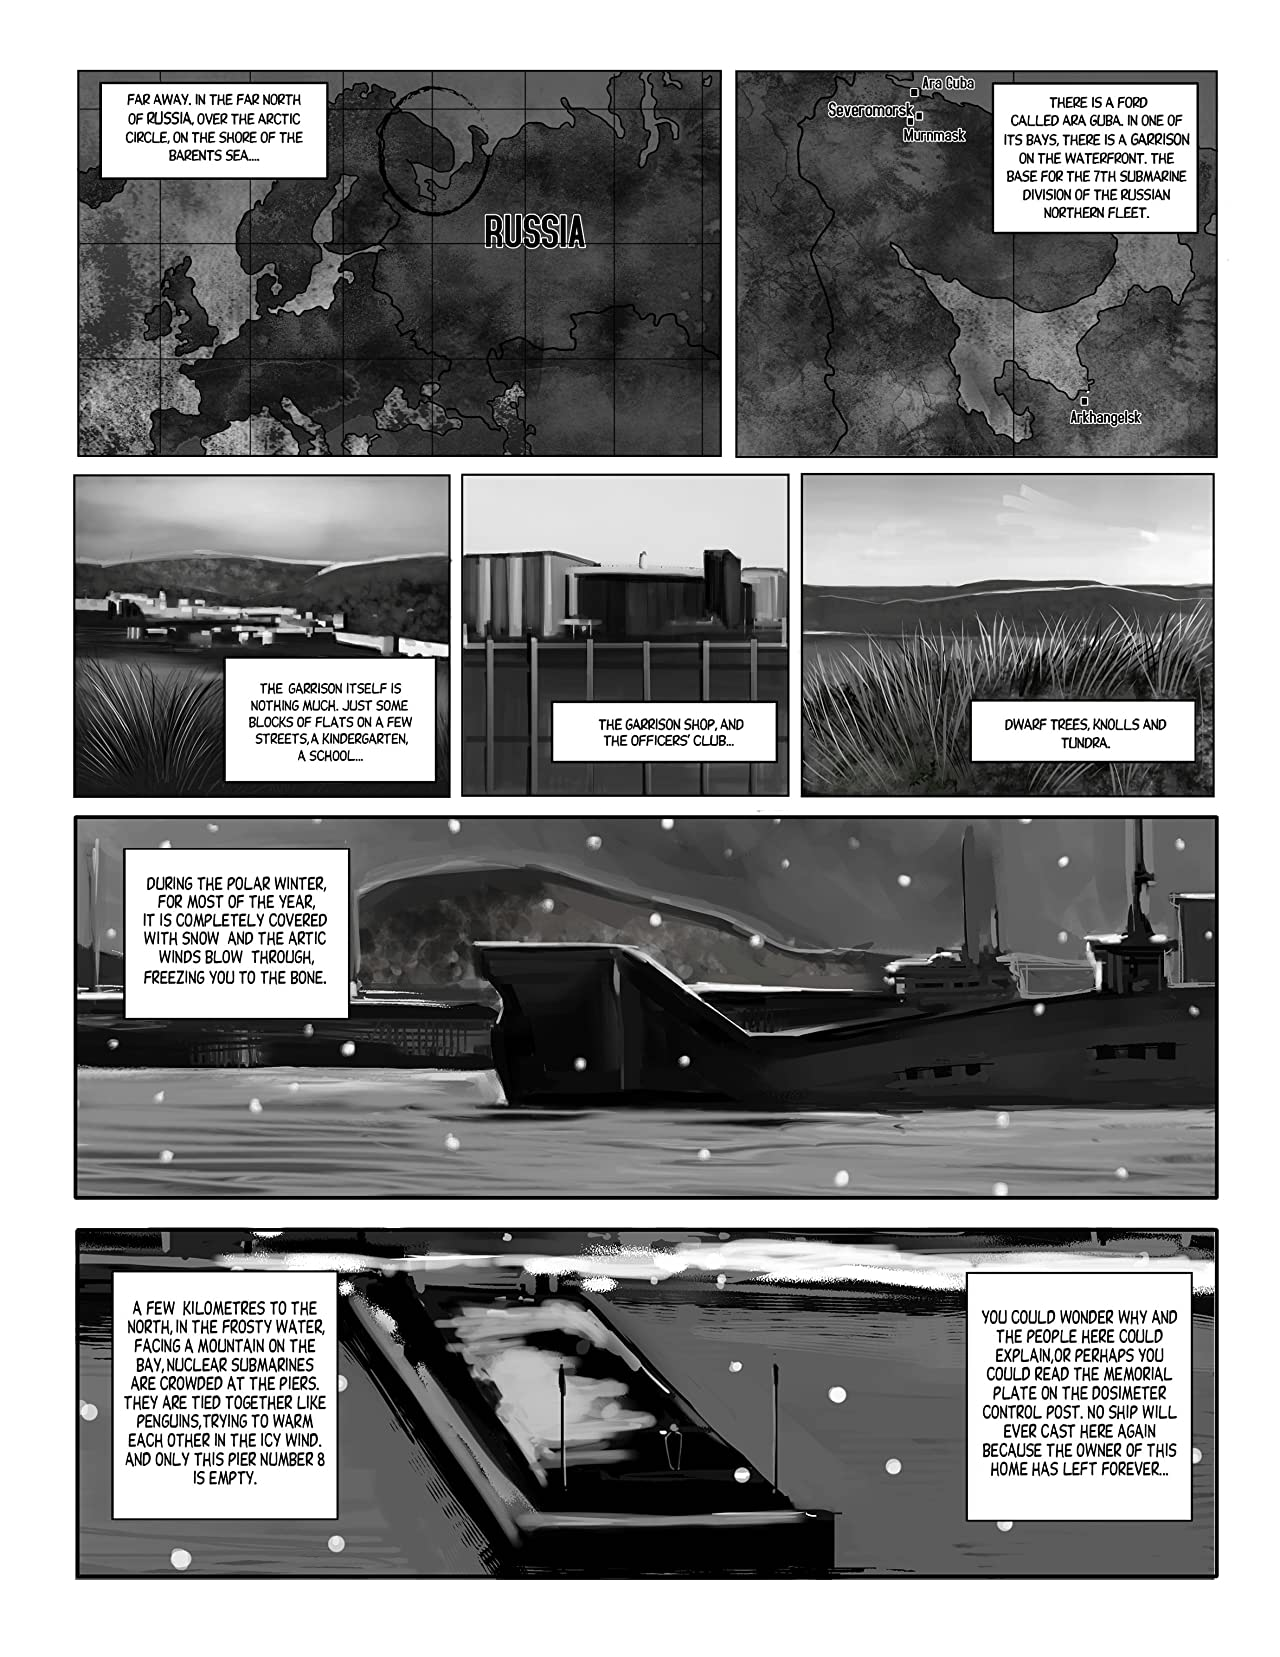 The Kursk #1